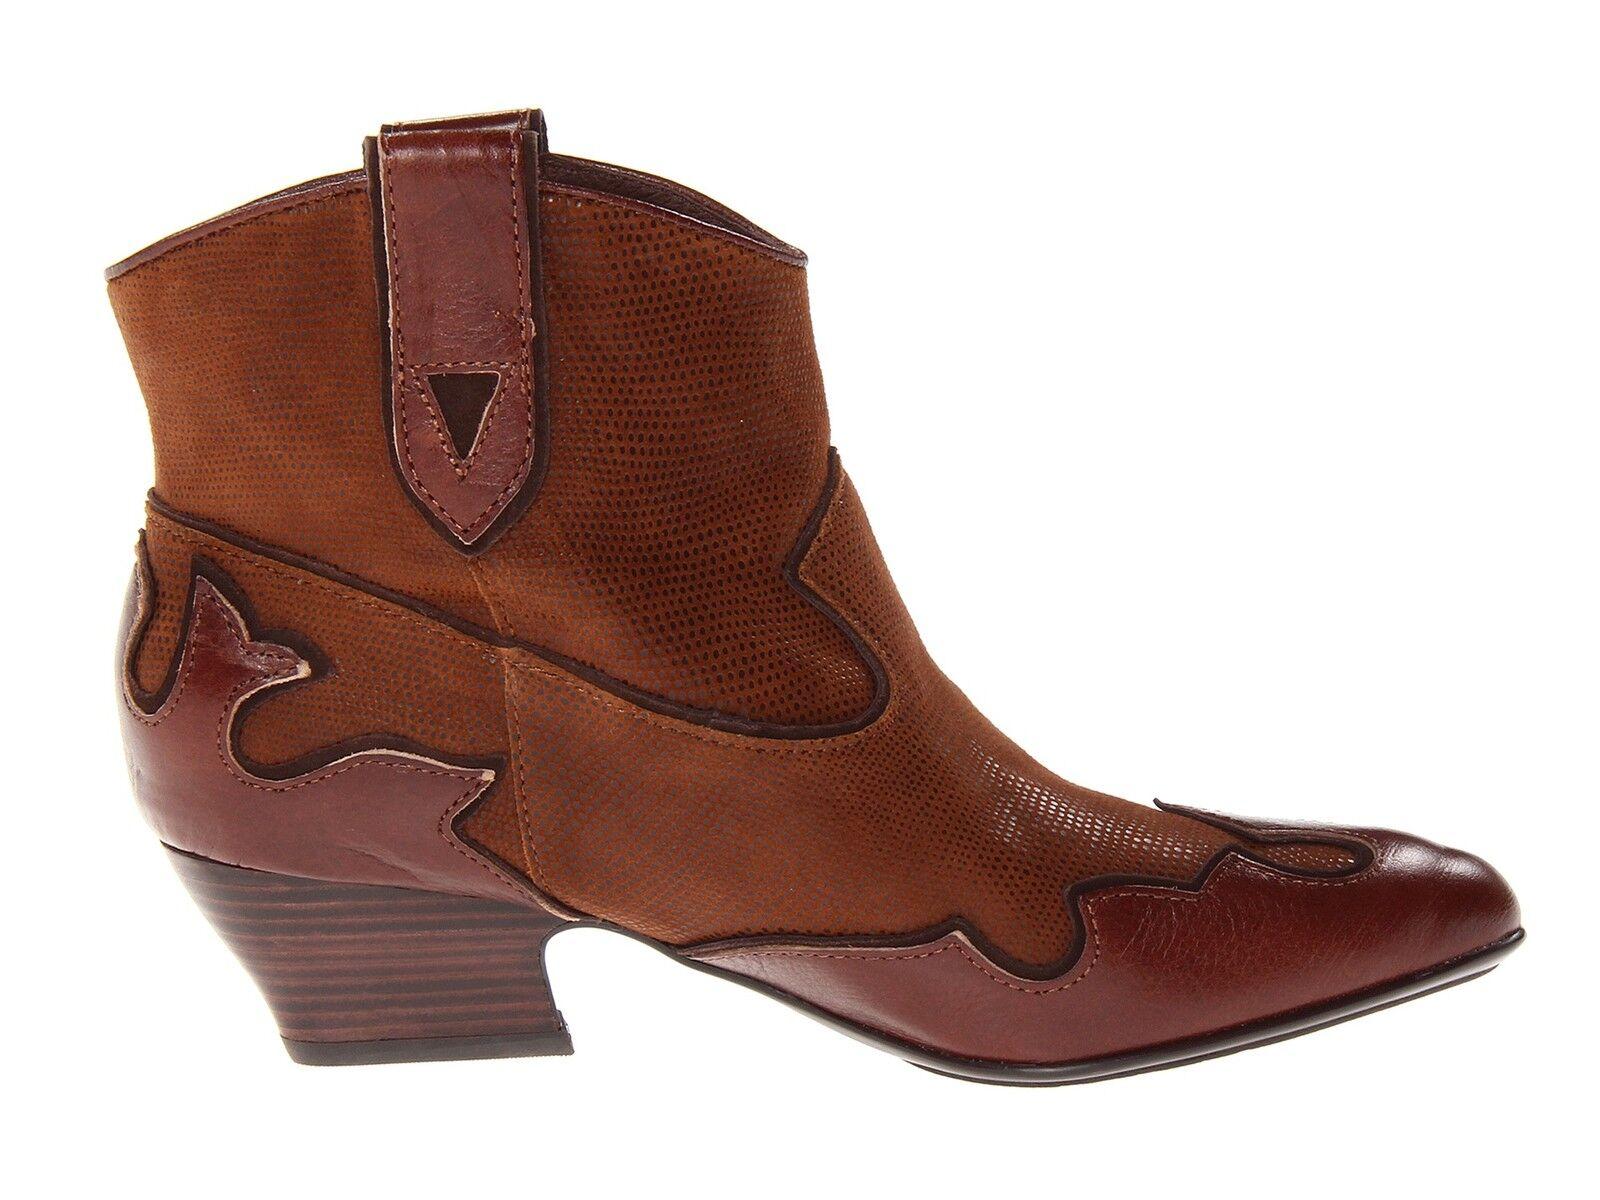 New Isola Odin Leder pull-on ankle Stiefel sz western Damens's sz Stiefel US 7 7cddab